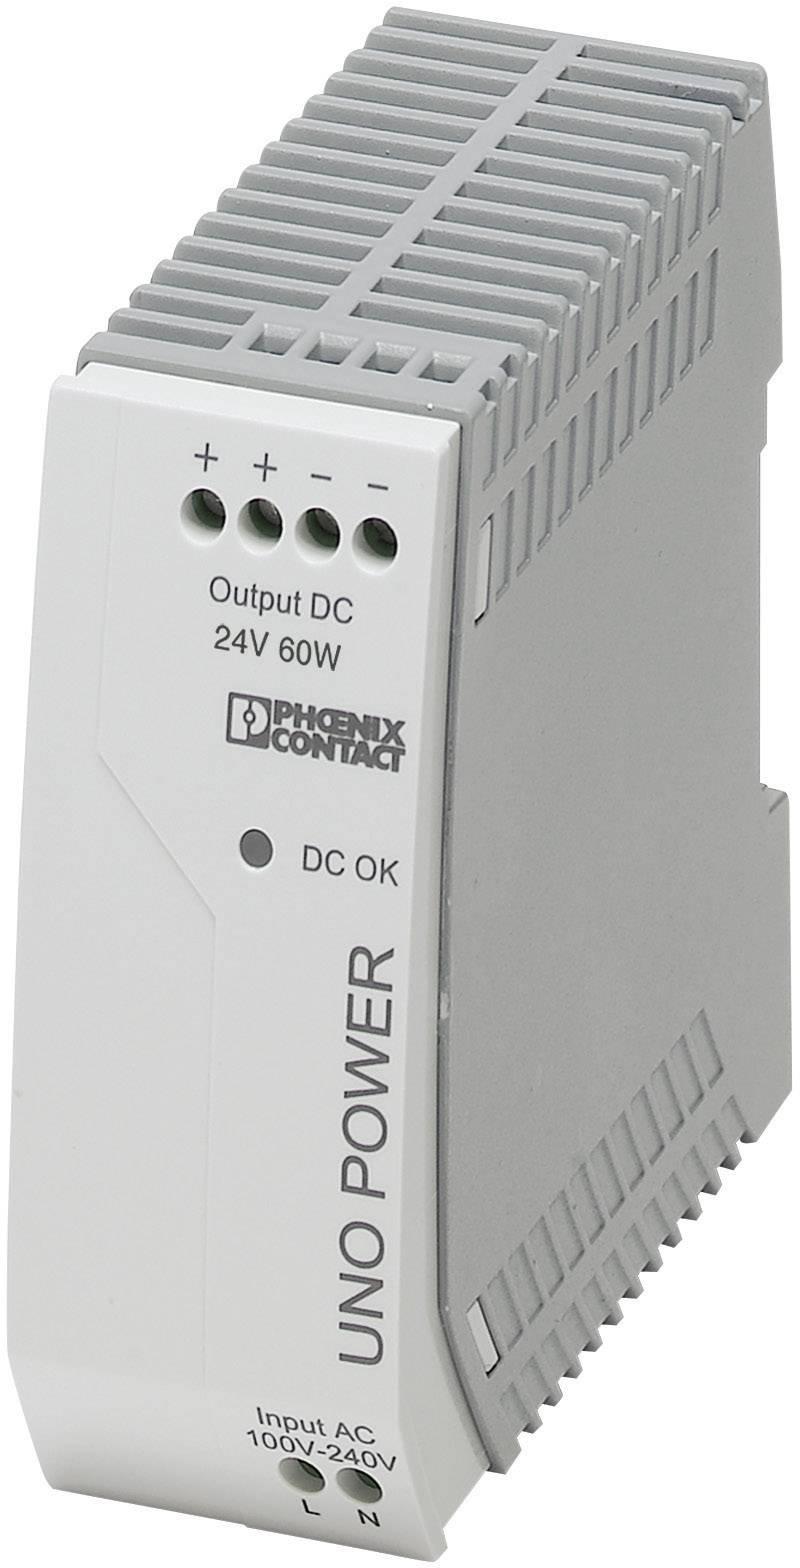 Zdroj na DIN lištu Phoenix Contact UNO-PS/1AC/24DC/60W, 2,5 A, 24 V/DC